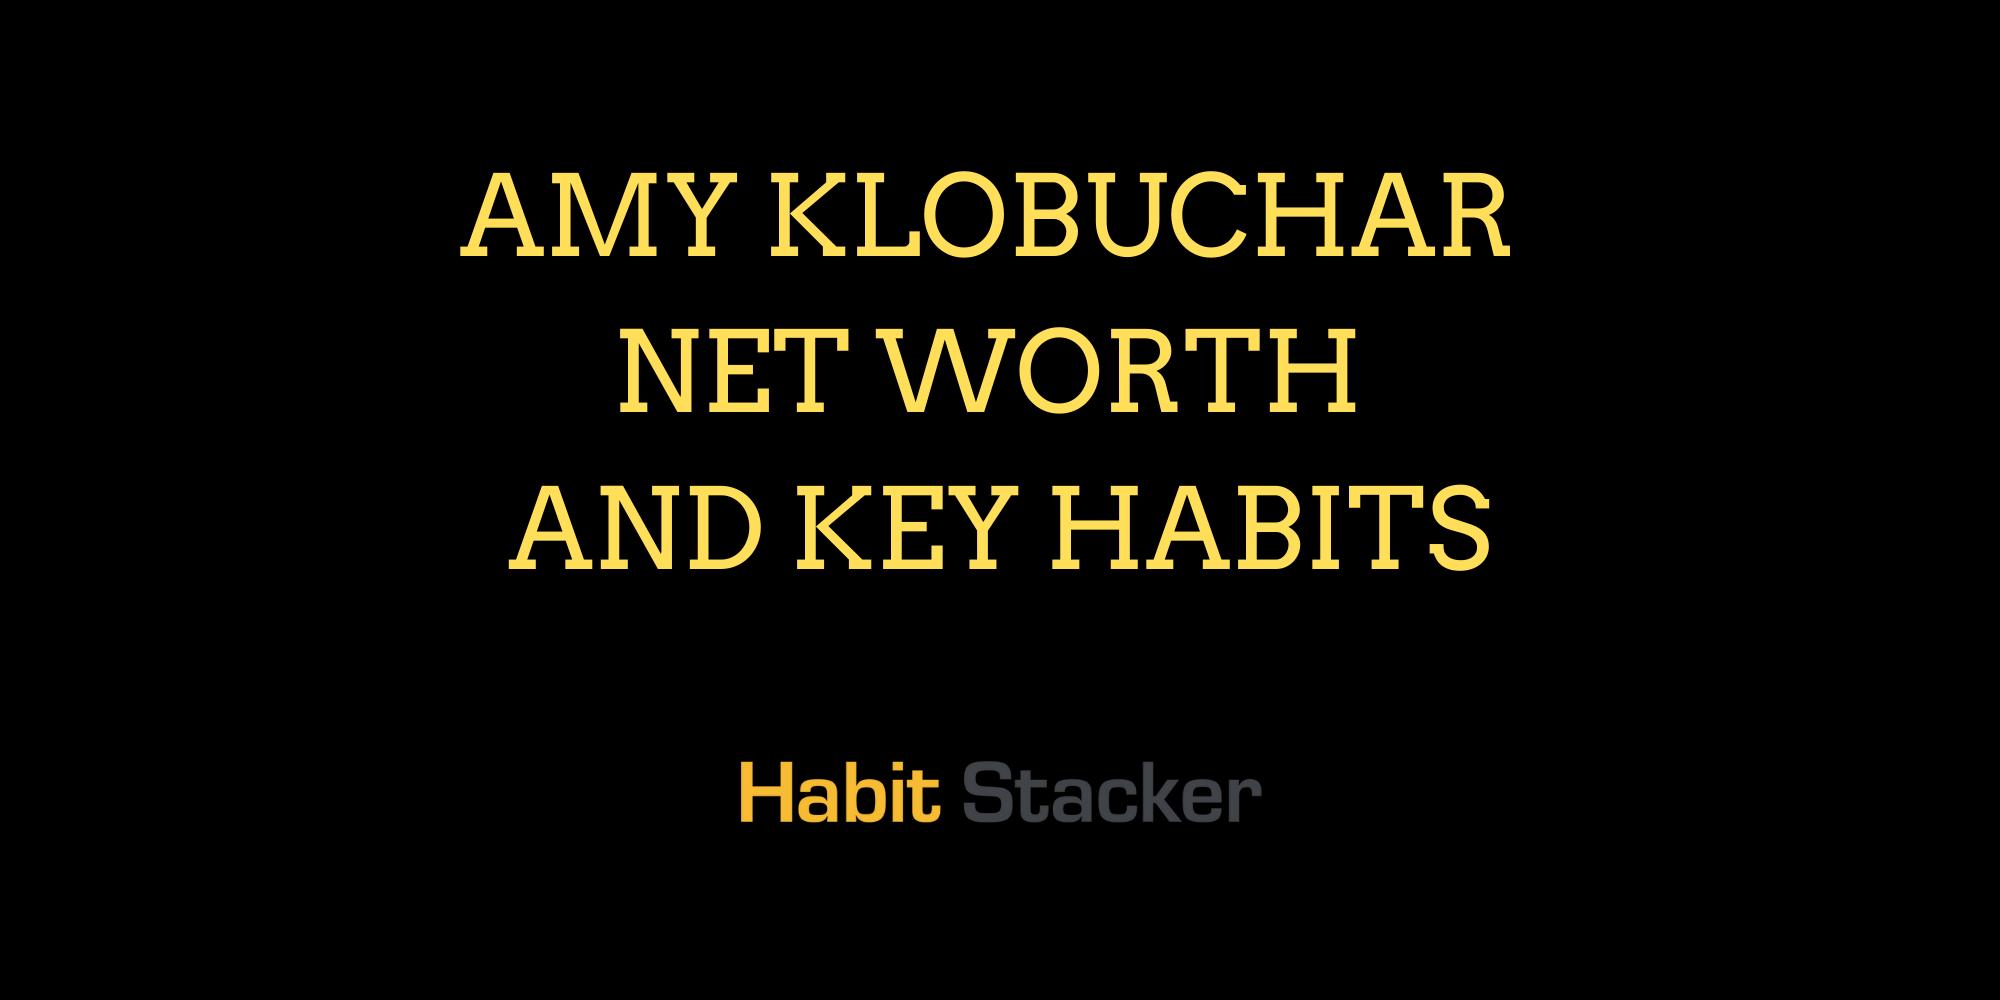 Amy Klobuchar Net Worth and Key Habits